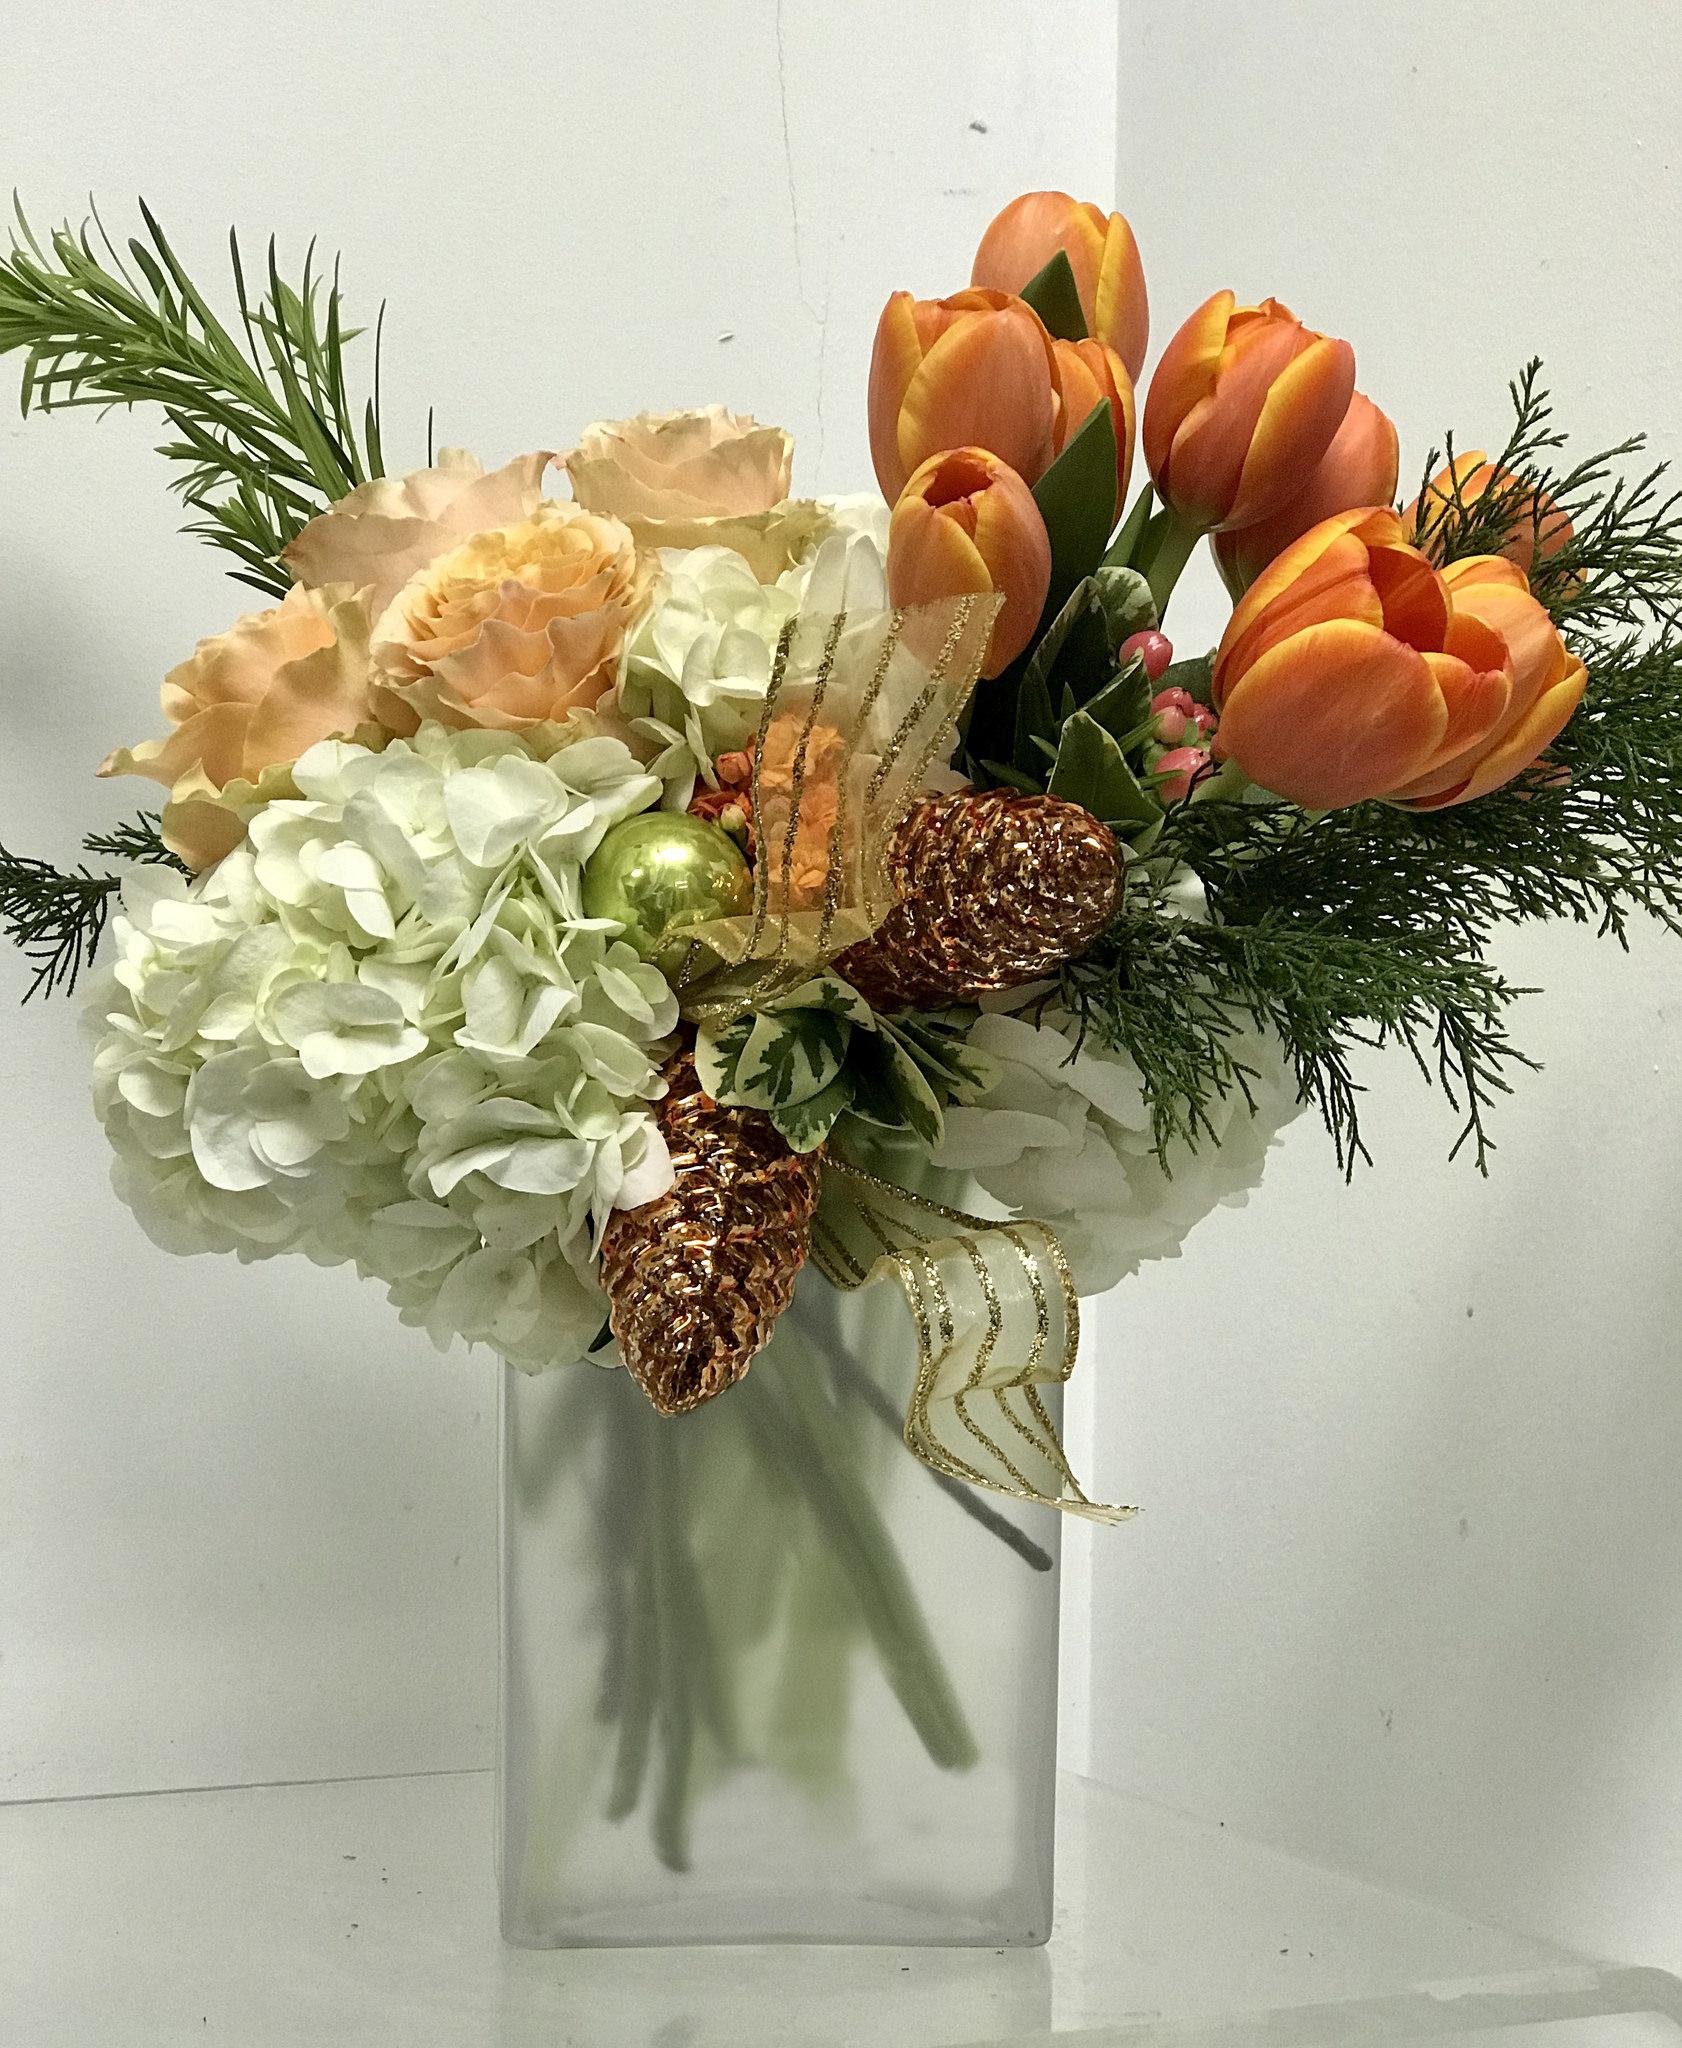 Award of Excellence Allen's Flower Market is Recipient of City Beat News 2018 Spectrum